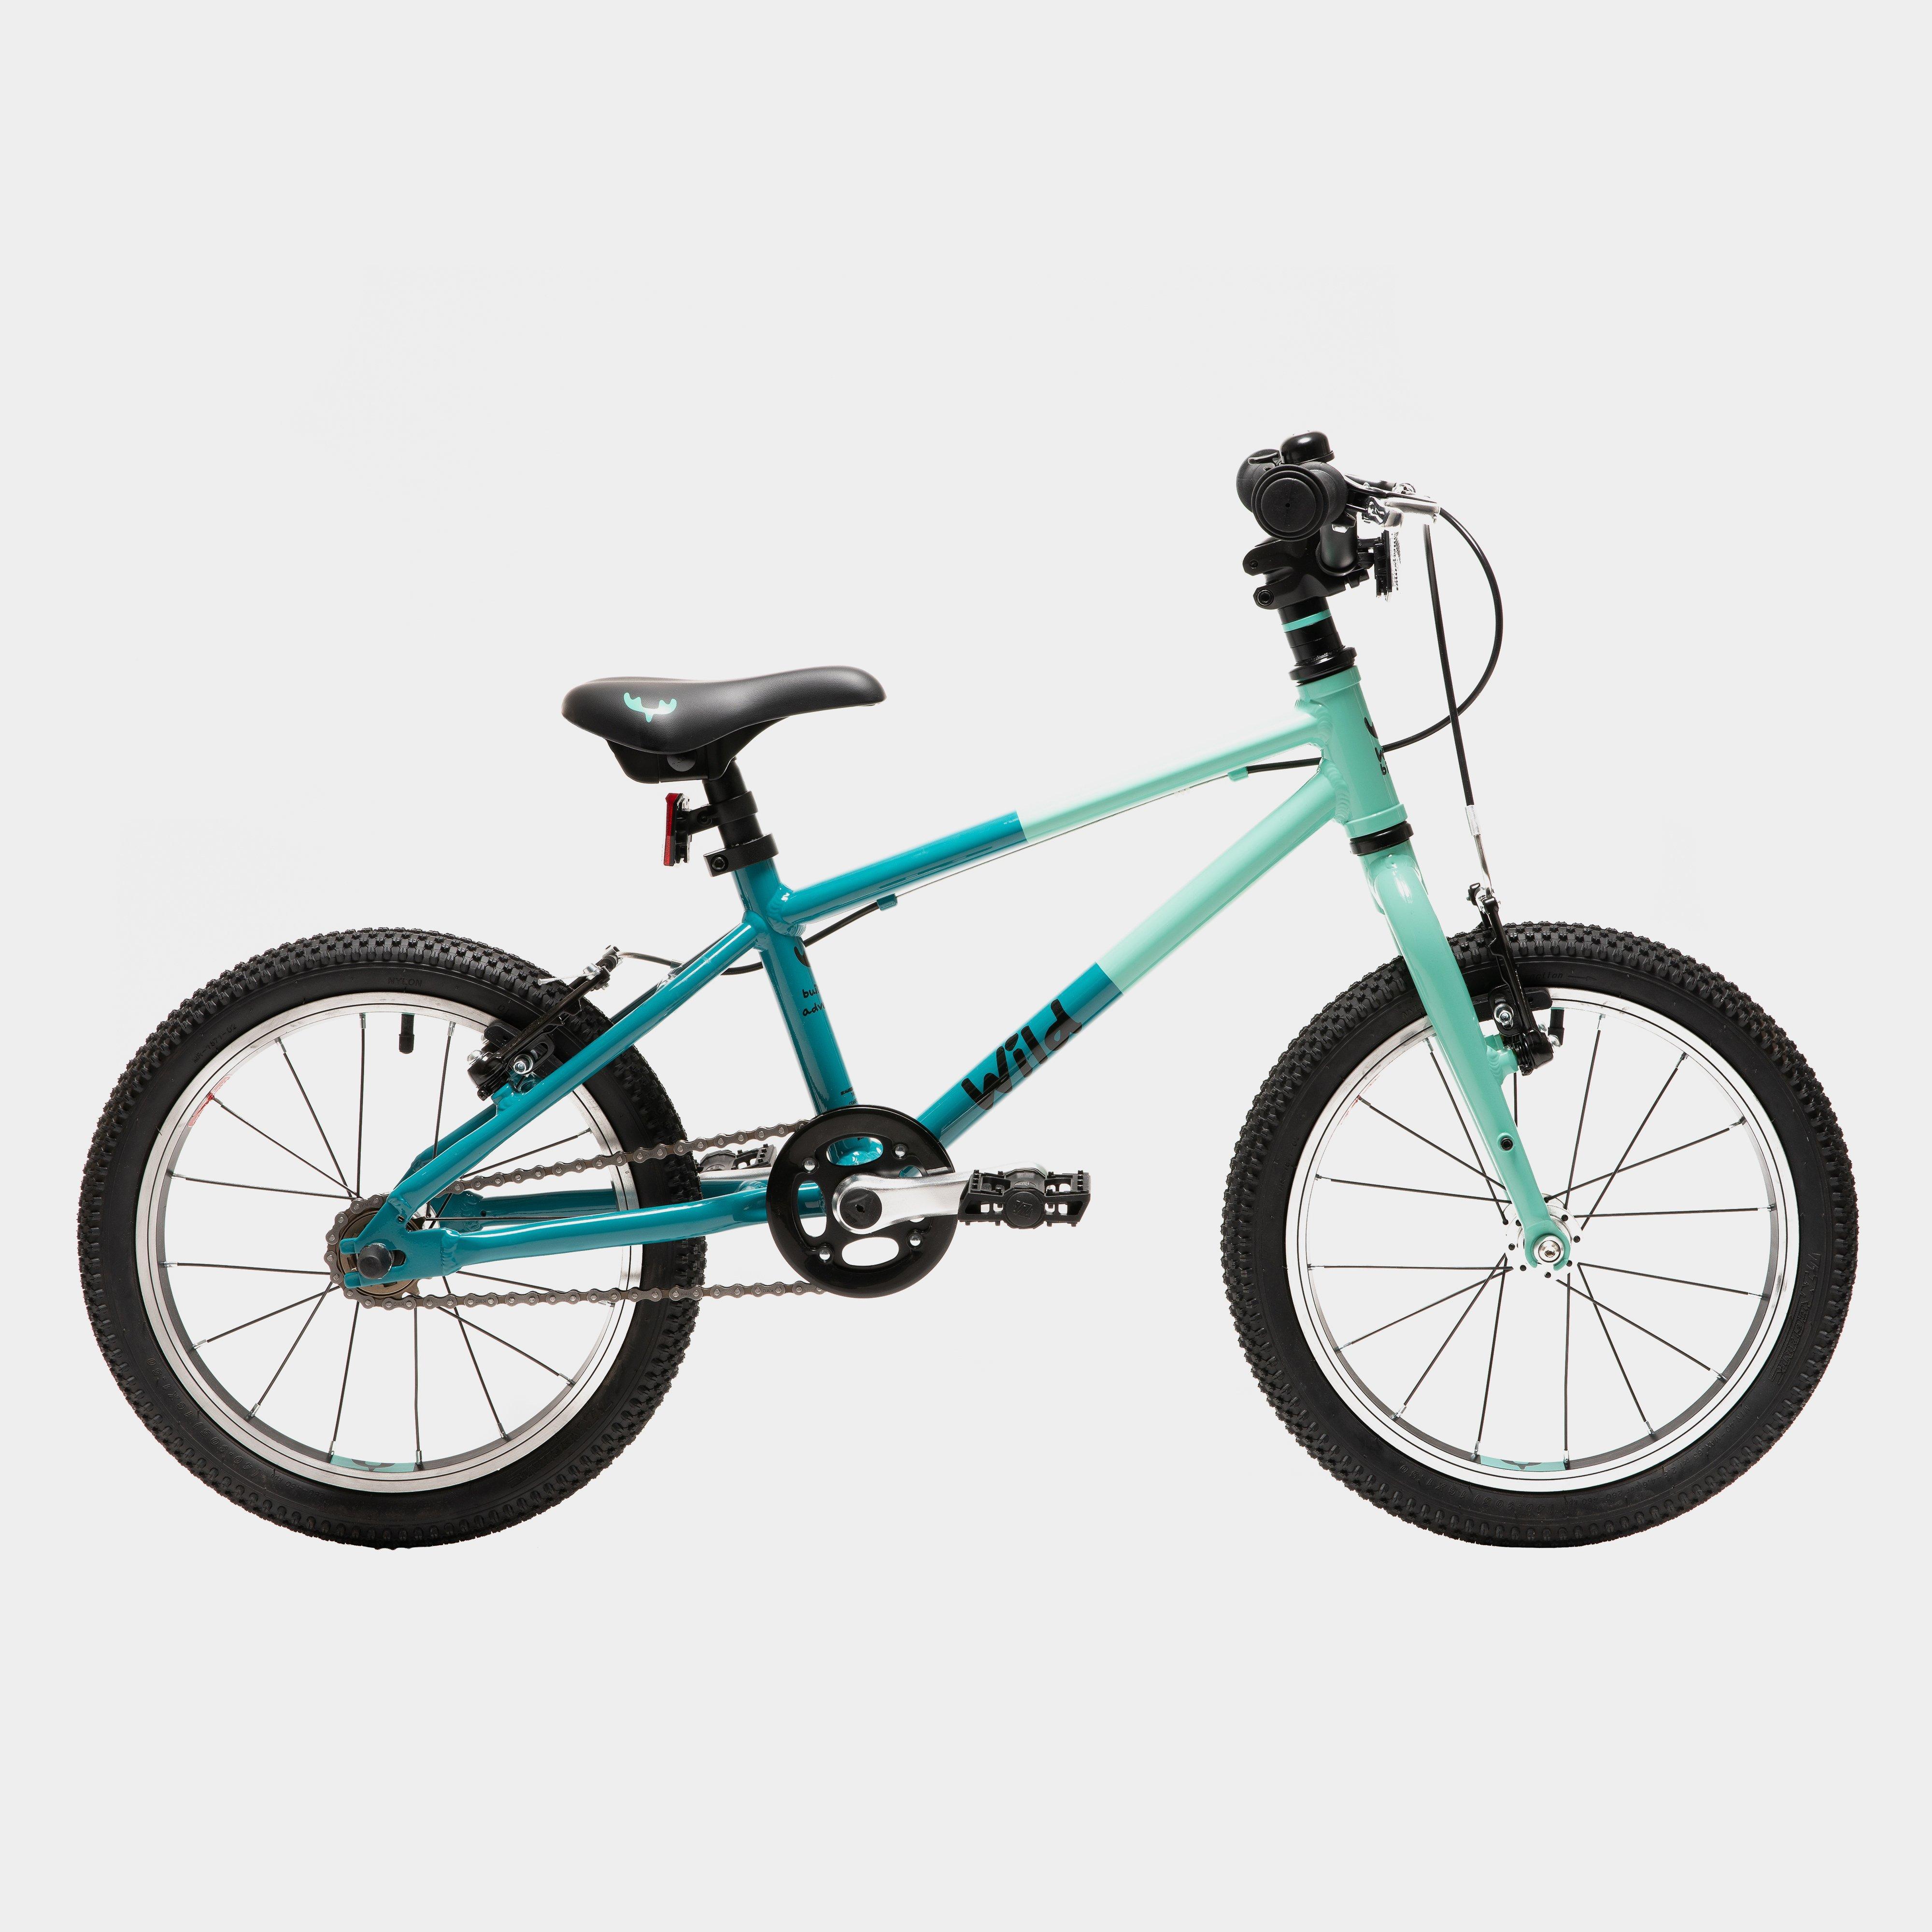 Wild Bikes Wild 16 Kids' Bike, GREEN-MINT/GIRLS